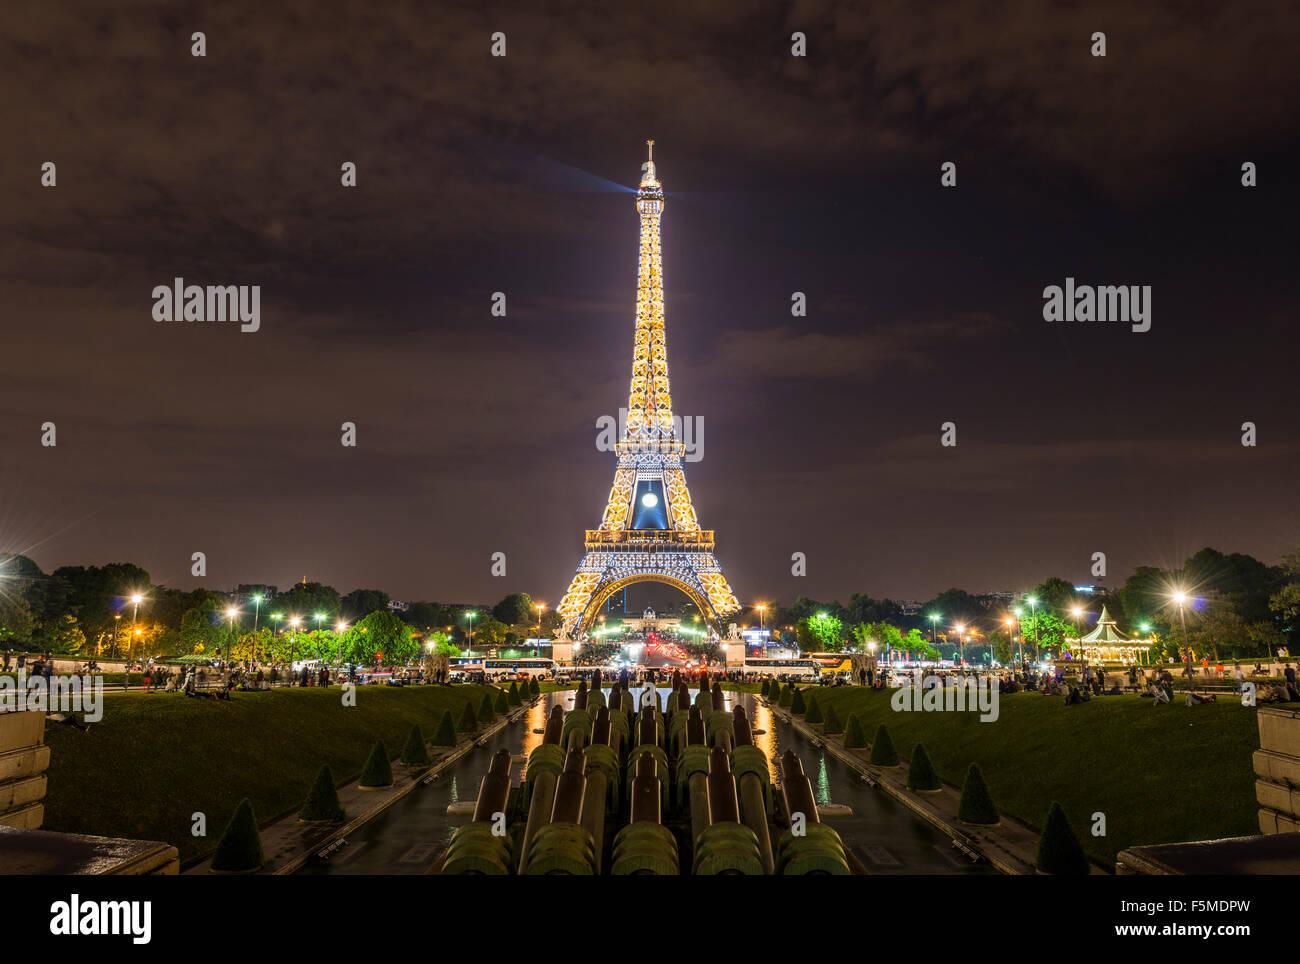 Beleuchteten Eiffelturm bei Nacht, Trocadero, Tour Eiffel, Paris, Ile de France, Frankreich Stockbild